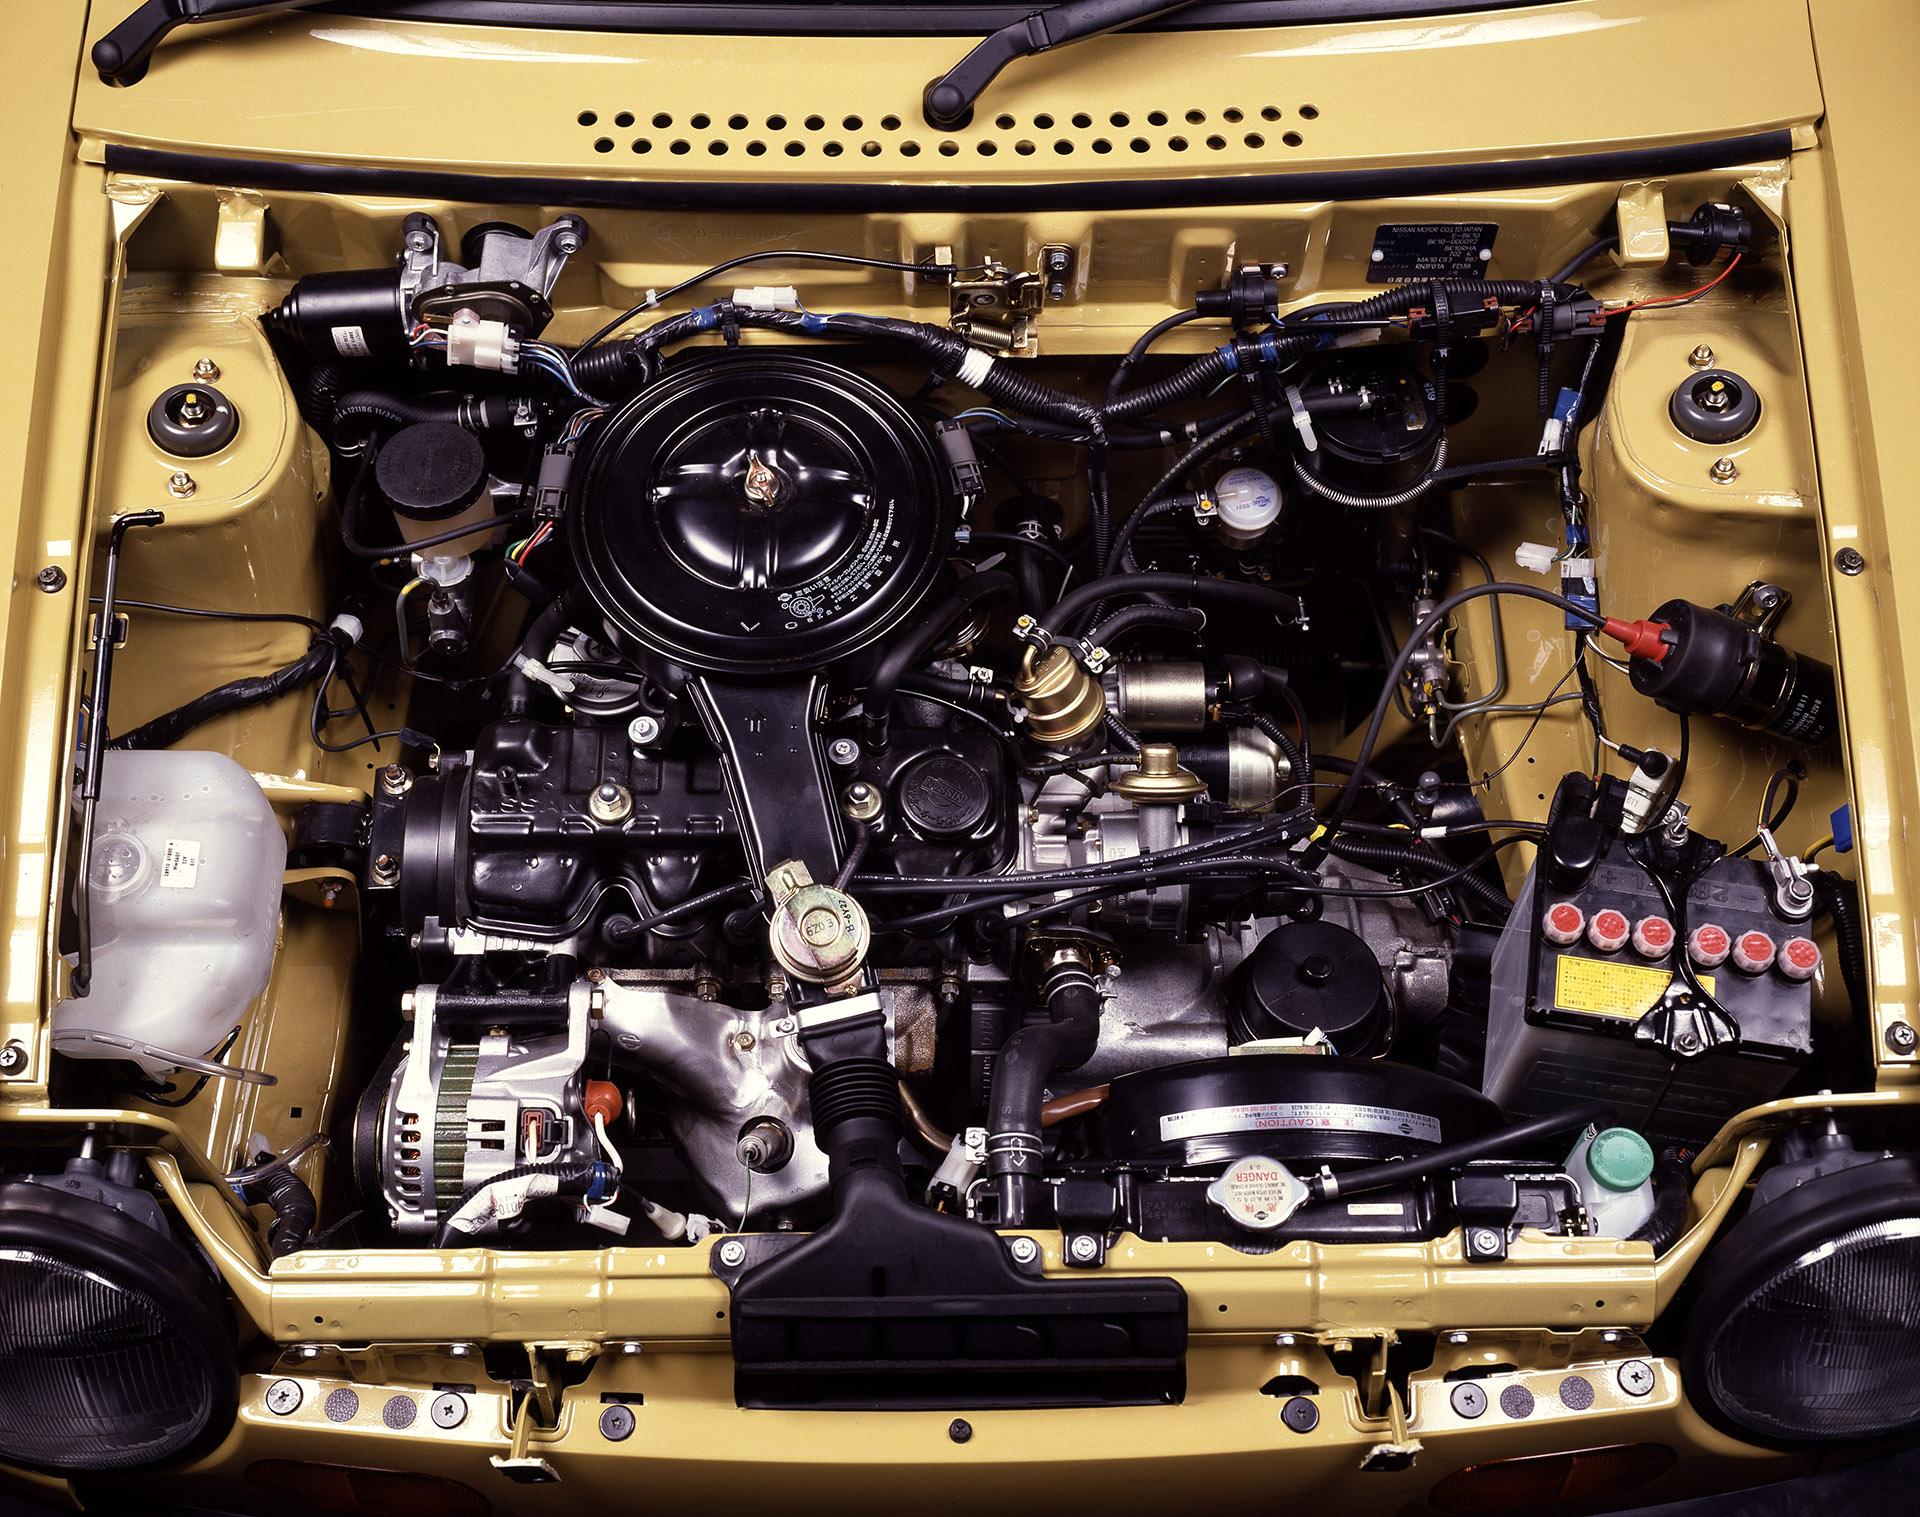 Nissan Be-1 engine